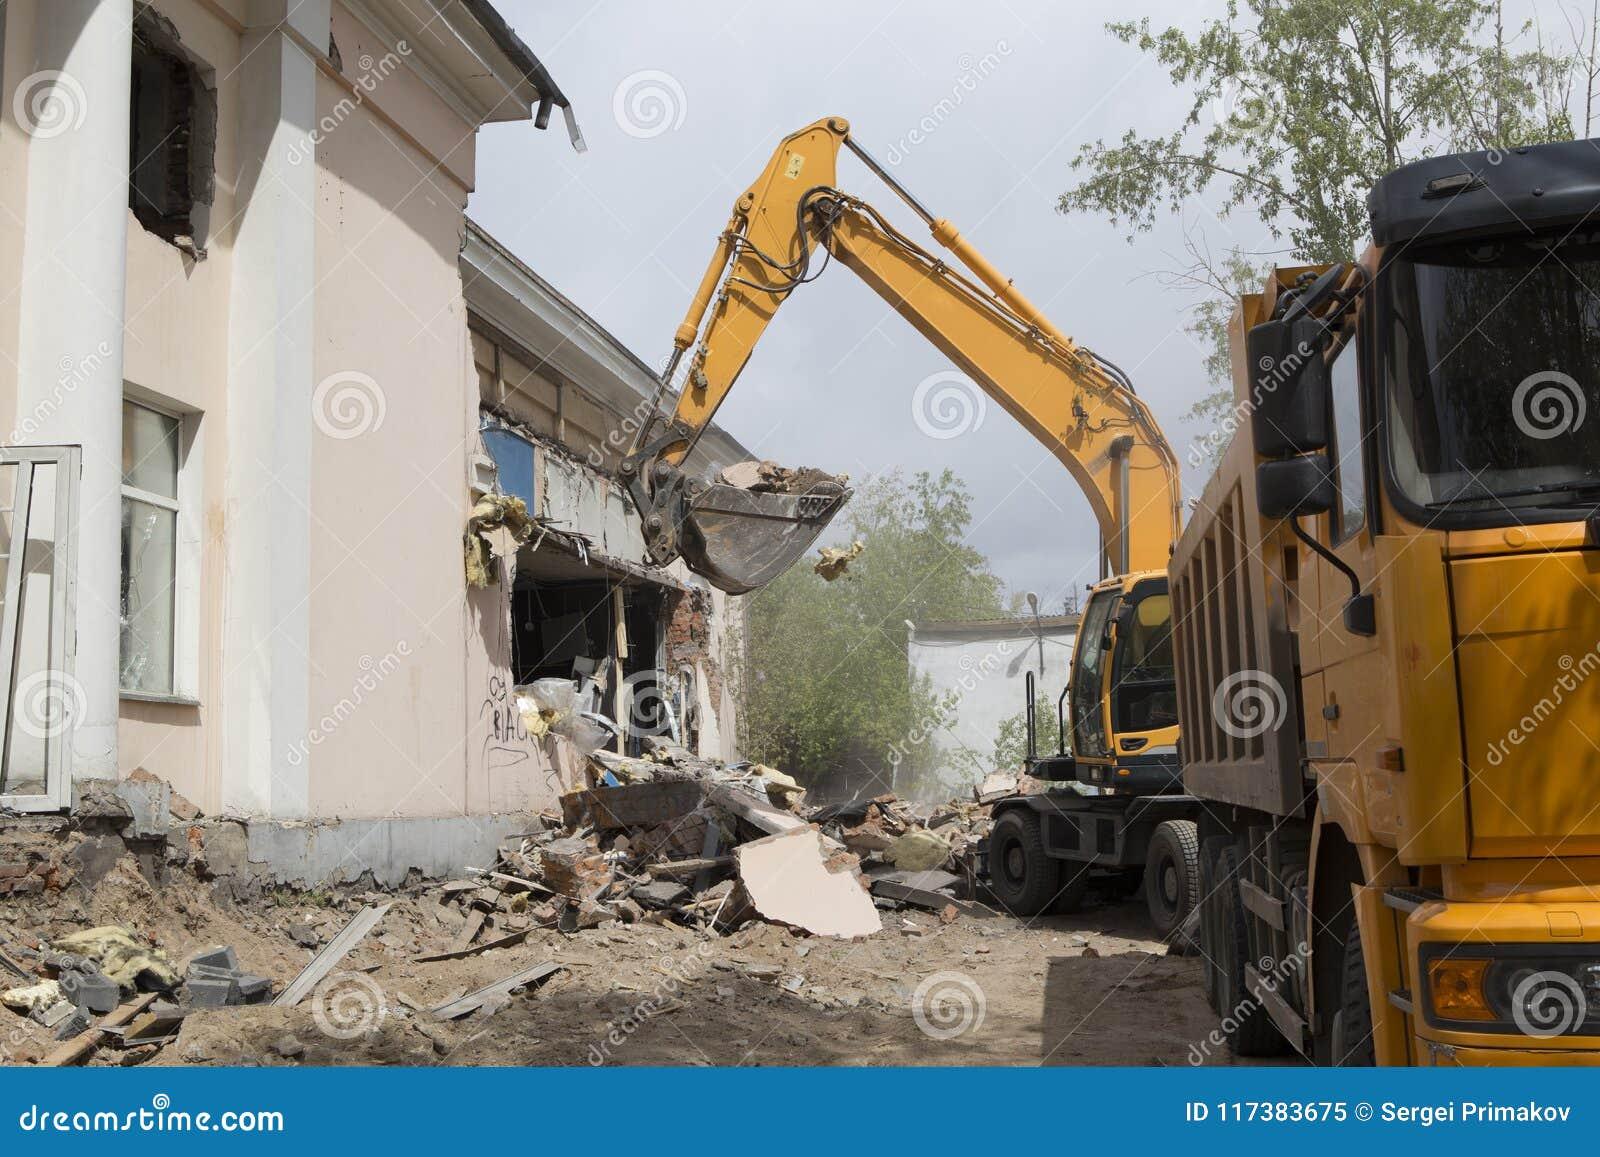 Loading Of Construction Debris After Demolition Of A